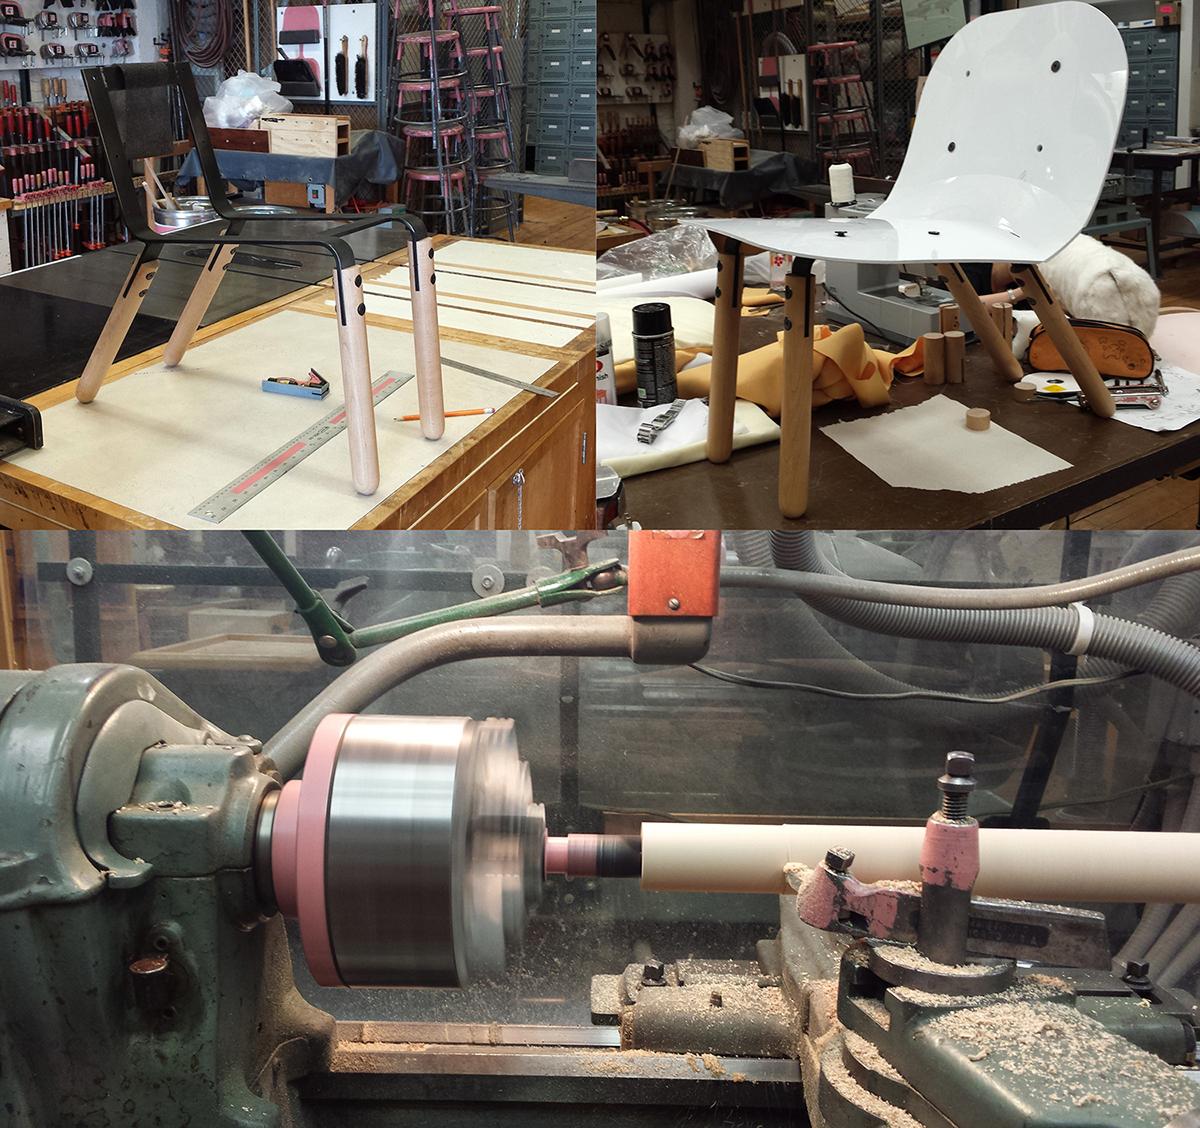 chair tuna upholstery welding TIG Welding plastic welding polypropylene maple Sushi